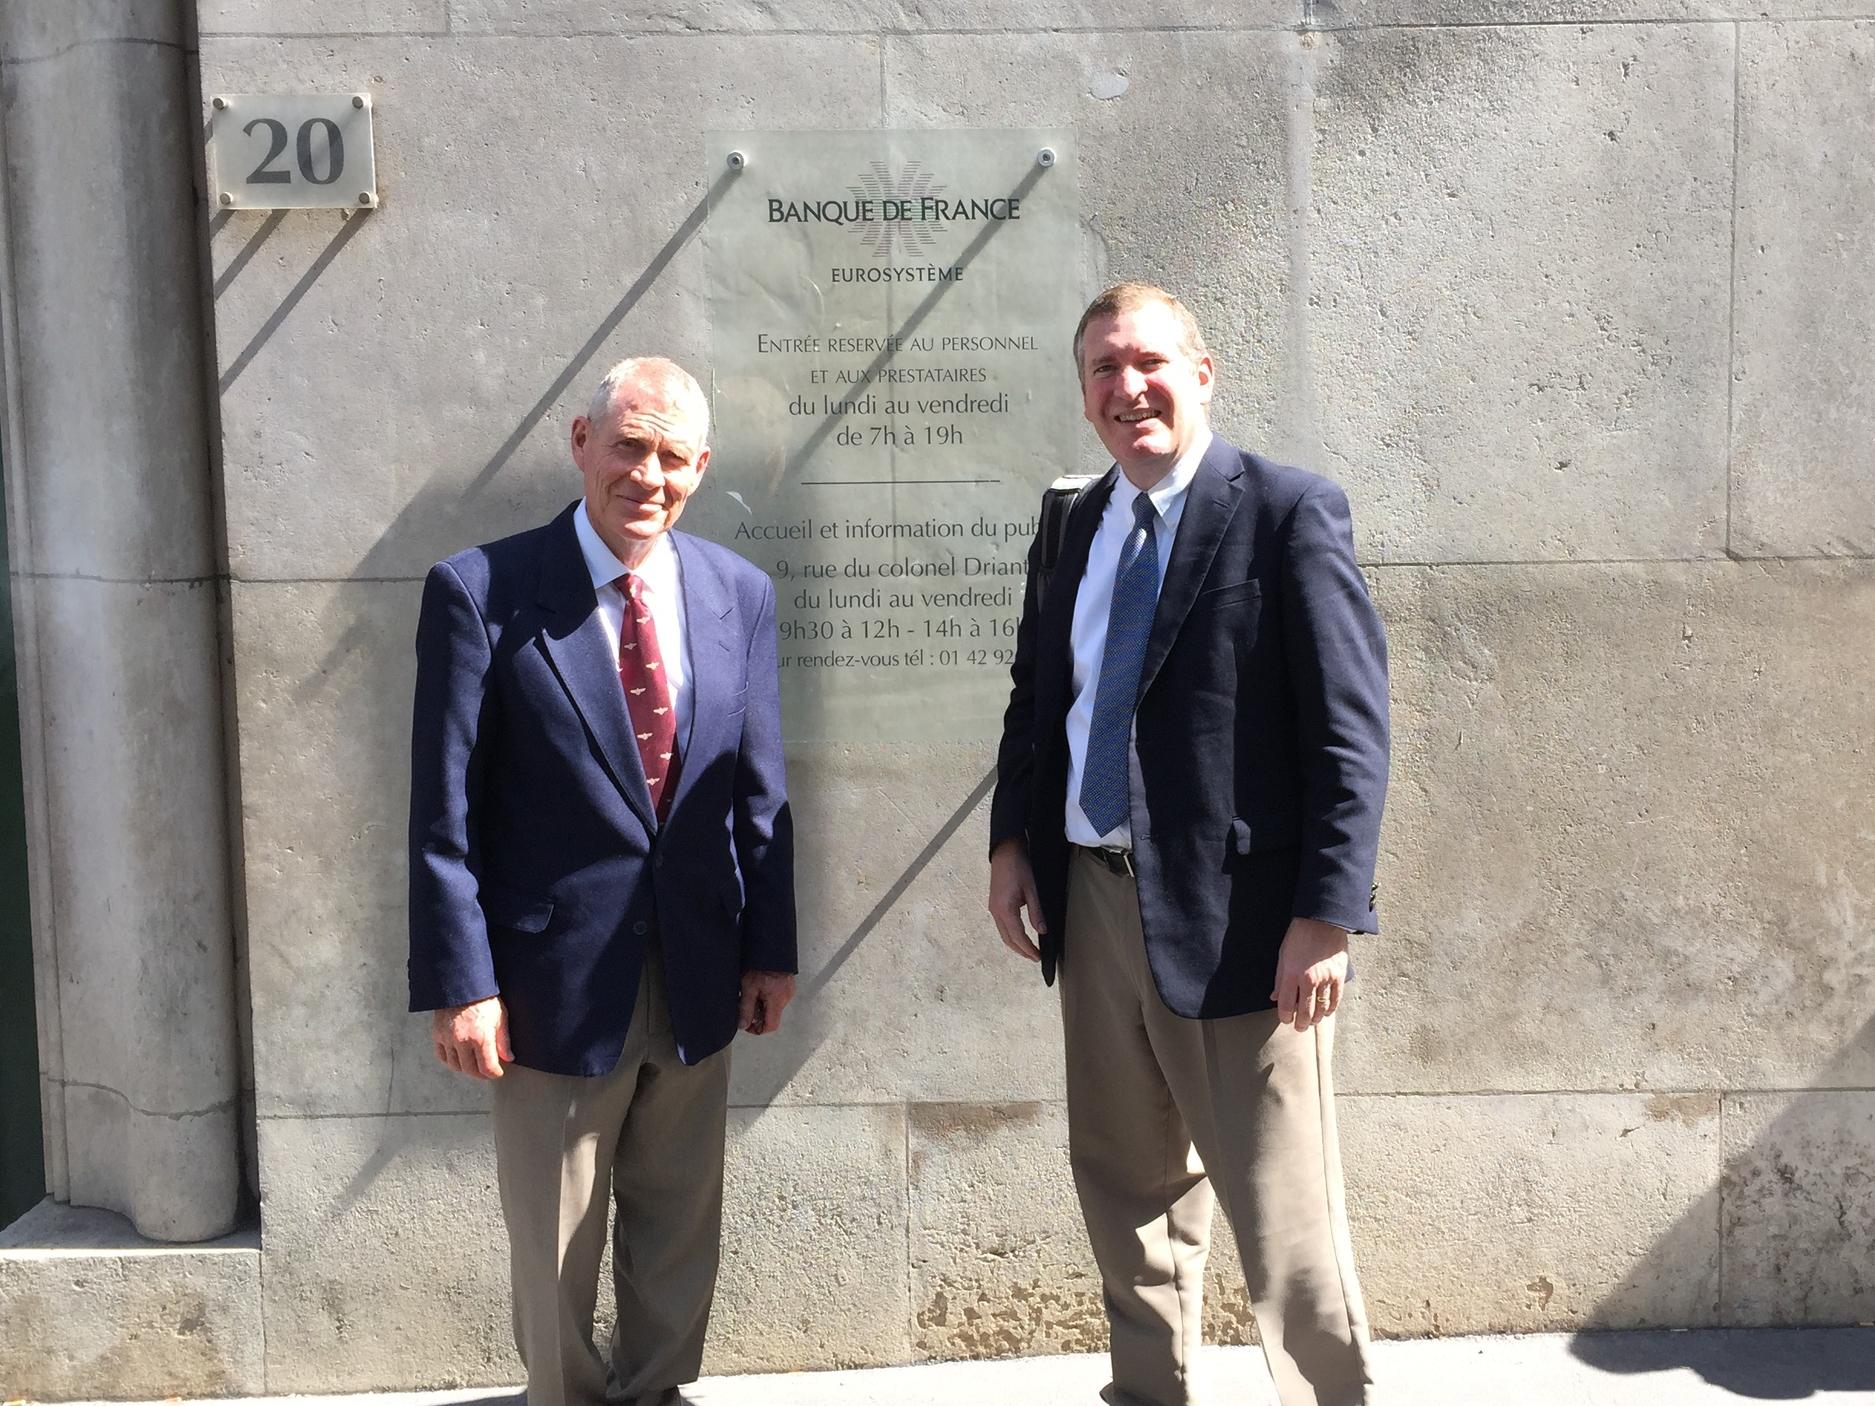 Larry Lunt and John Lunt at Banque de France